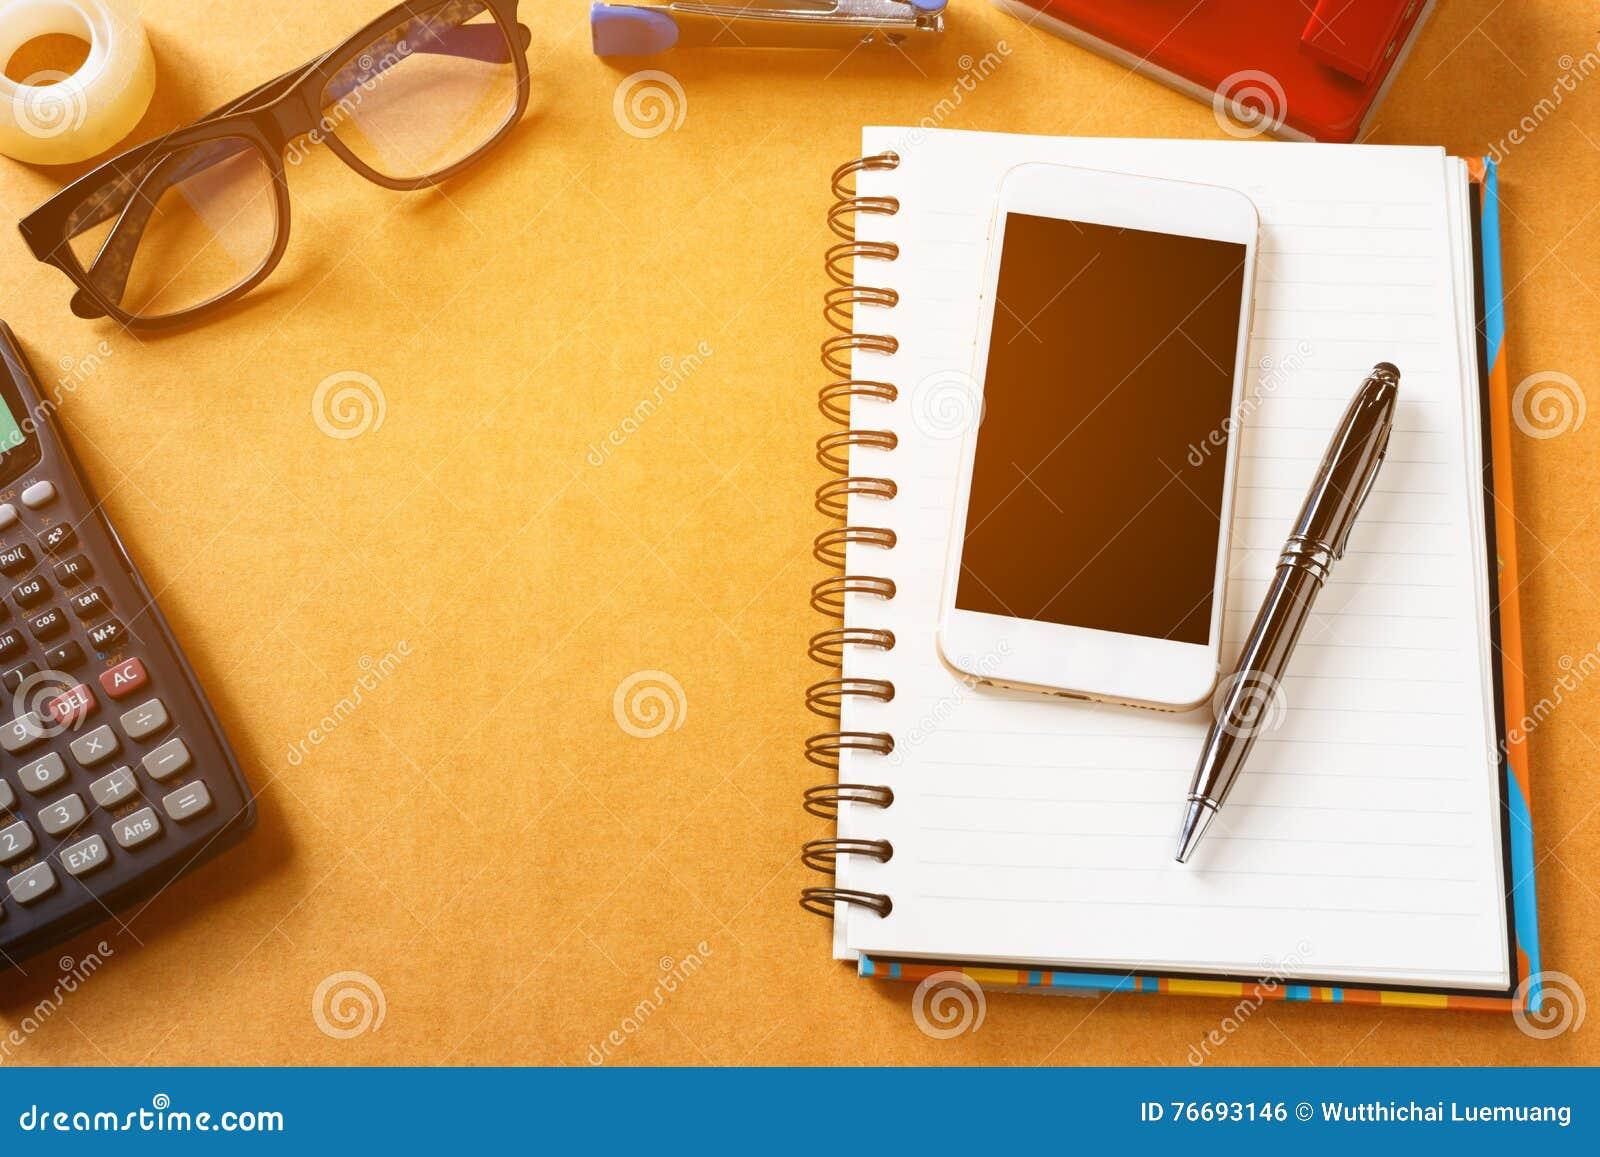 Fournitures De Bureau Instruments Et Telephone Intelligent Stylo